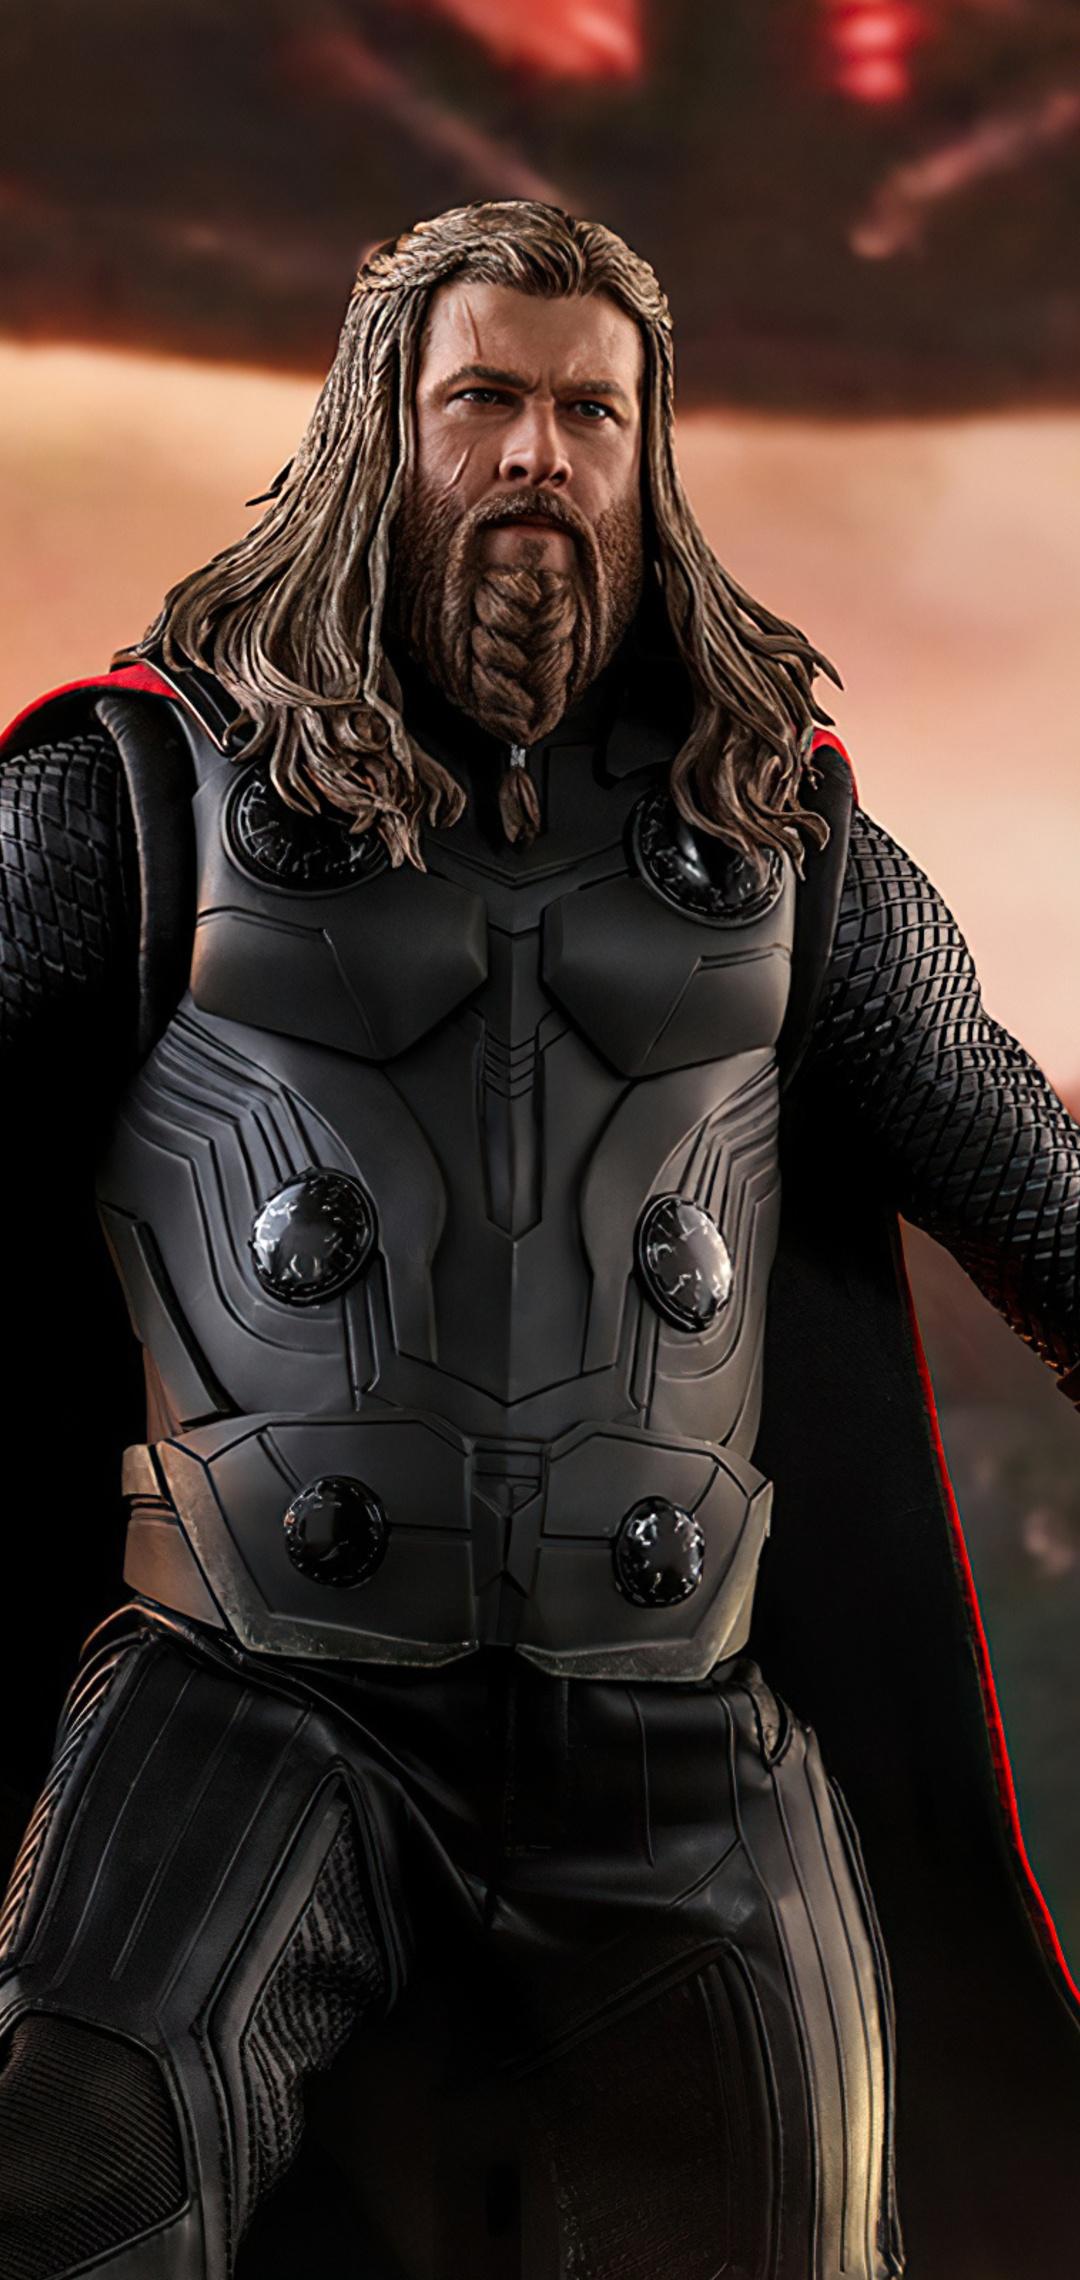 1080x2280 Thor Thunder Avengers Endgame One Plus 6,Huawei ...